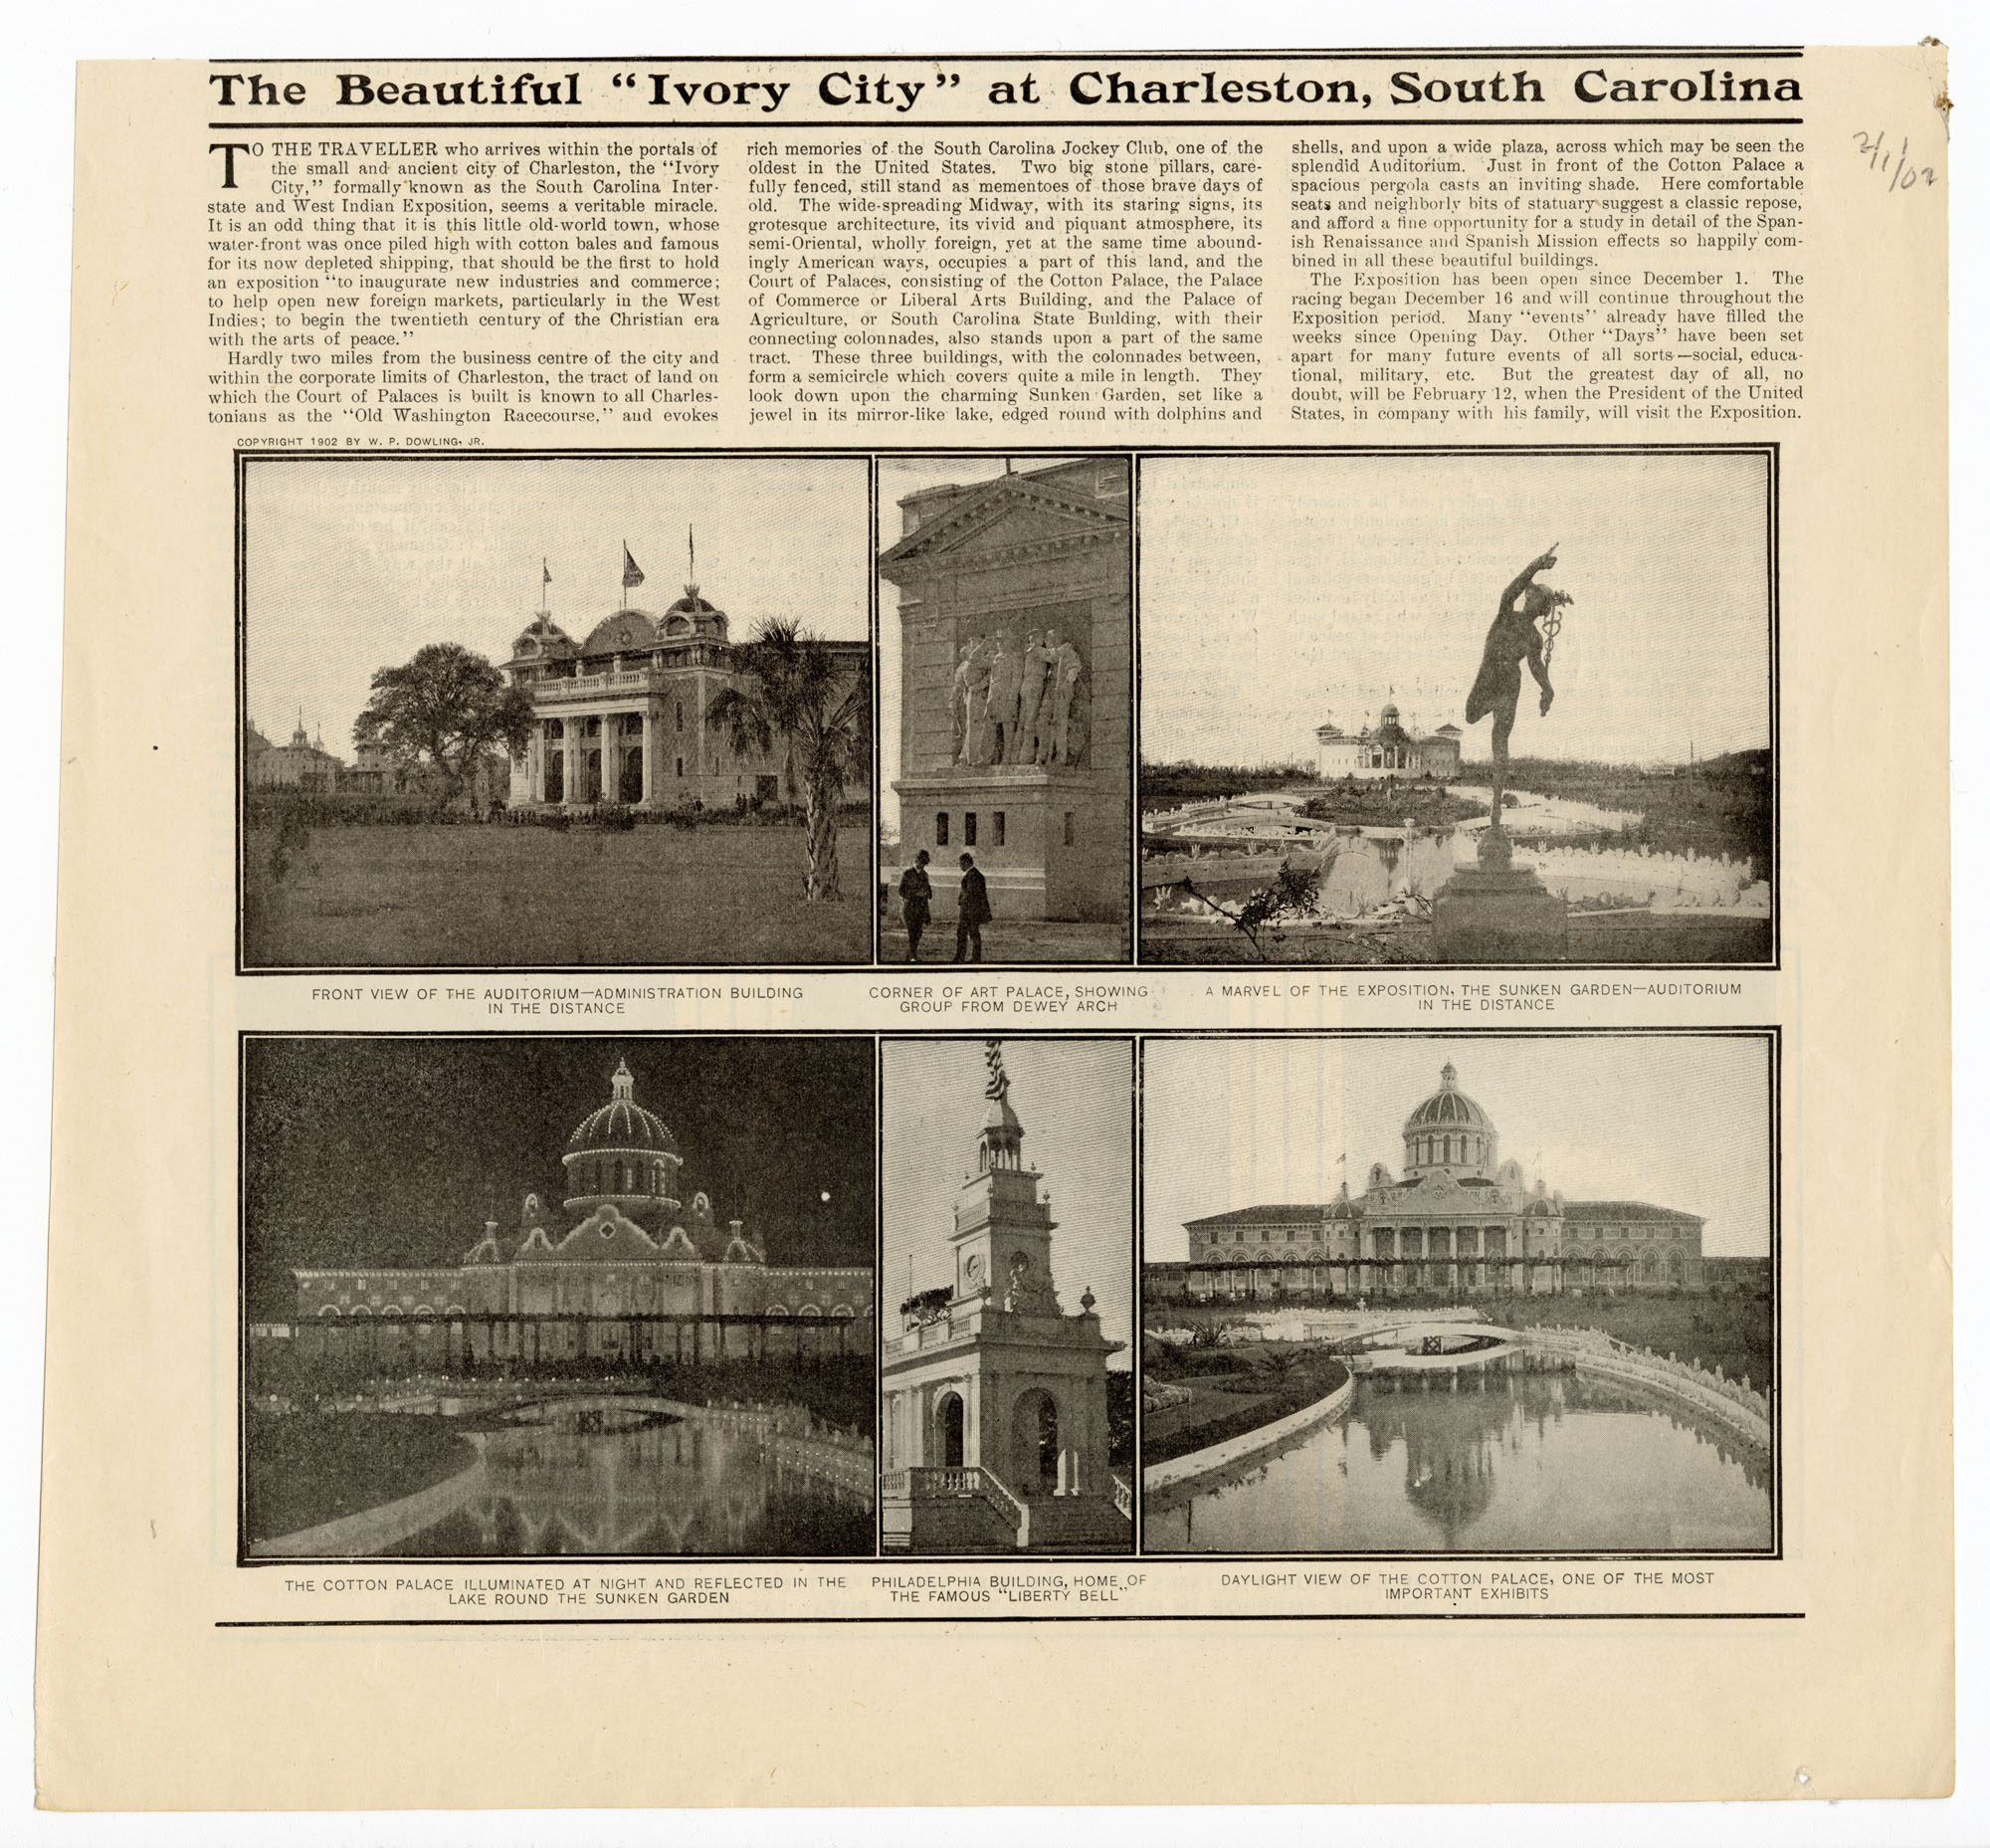 The Beautiful 'Ivory City' at Charleston, South Carolina